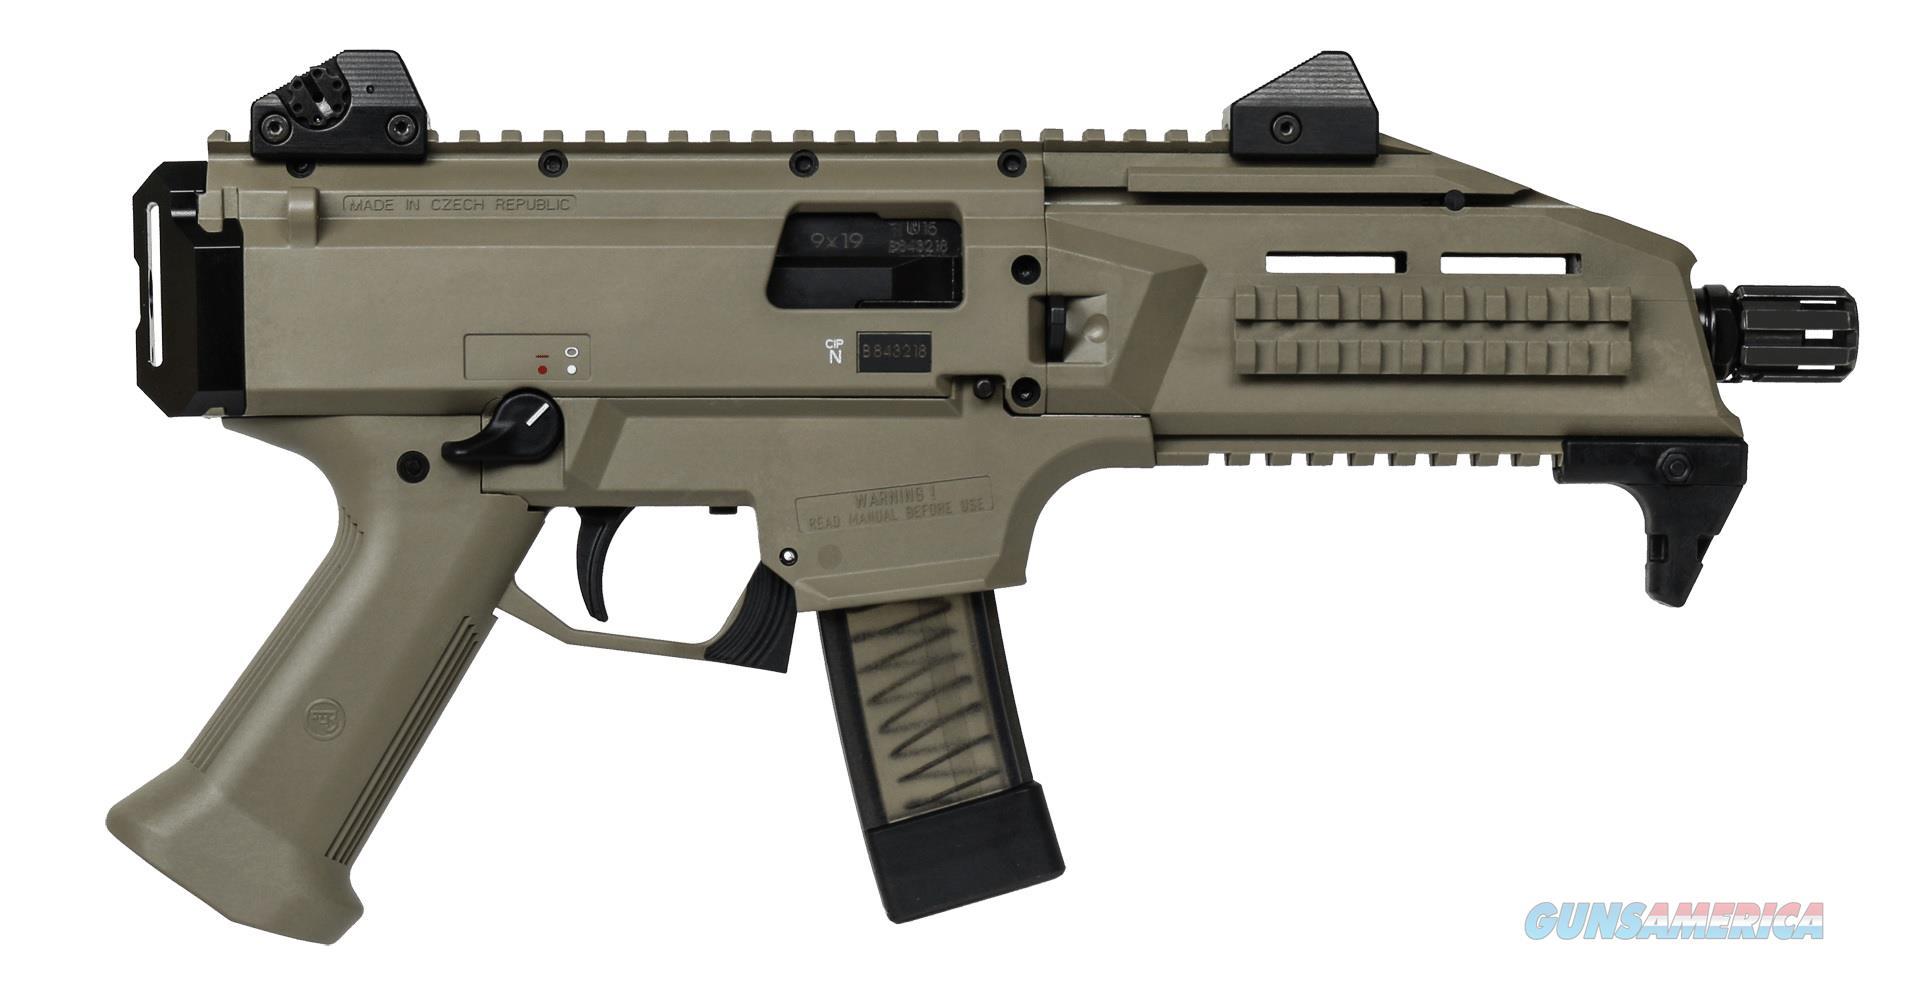 "CZ-USA Scorpion EVO 3 S1 9mm FDE 7.72"" Threaded 91352   Guns > Pistols > CZ Pistols"